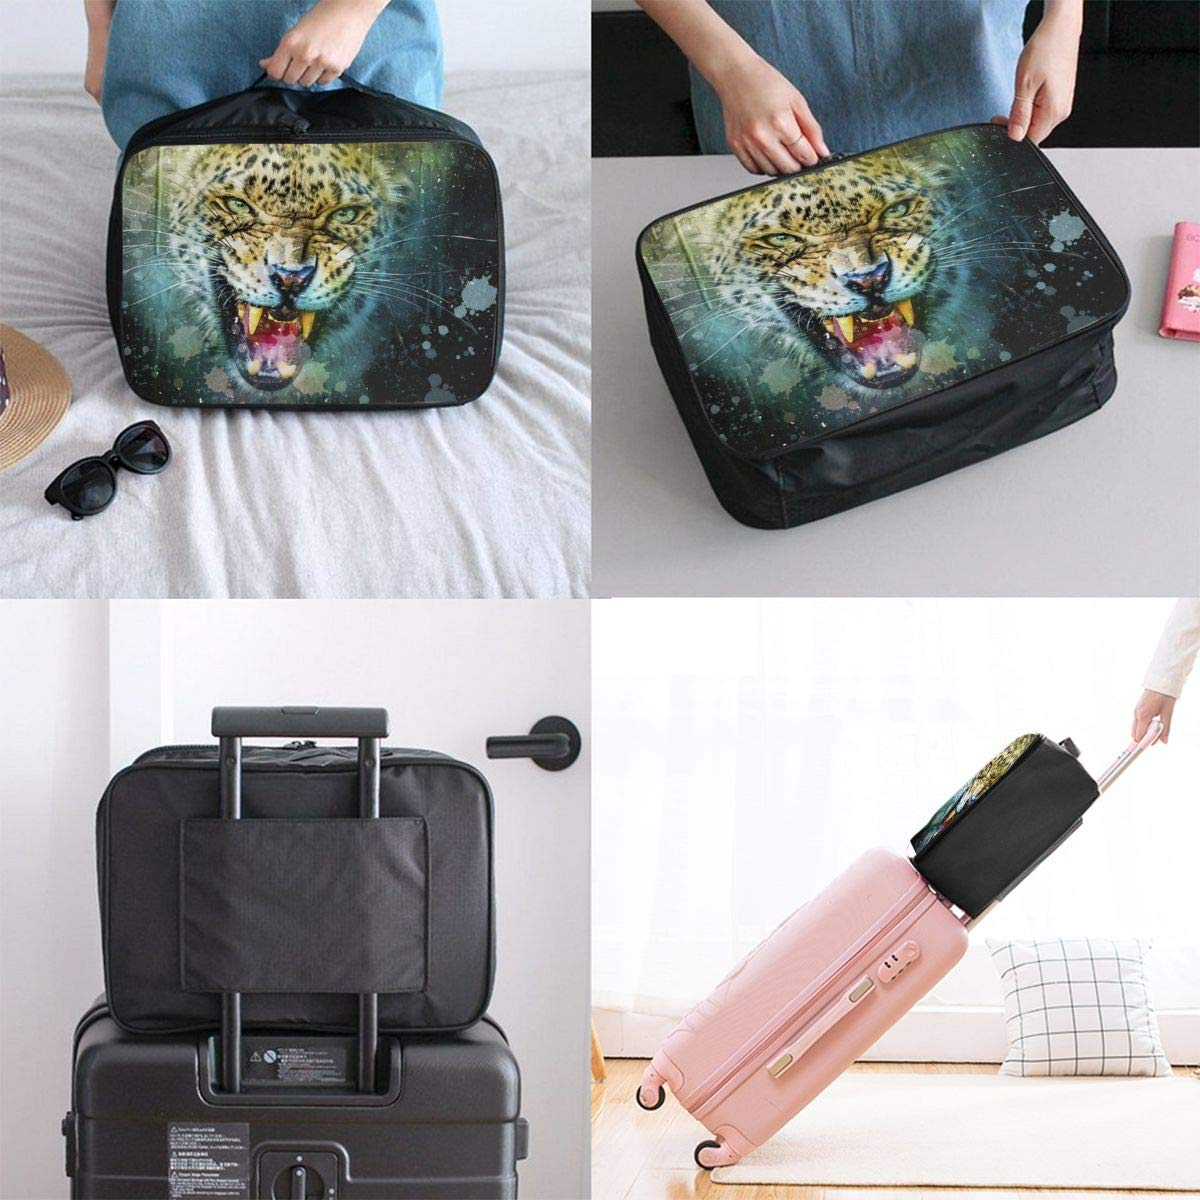 Leopard Predator Animal Travel Lightweight Waterproof Foldable Storage Carry Luggage Large Capacity Portable Luggage Bag Duffel Bag